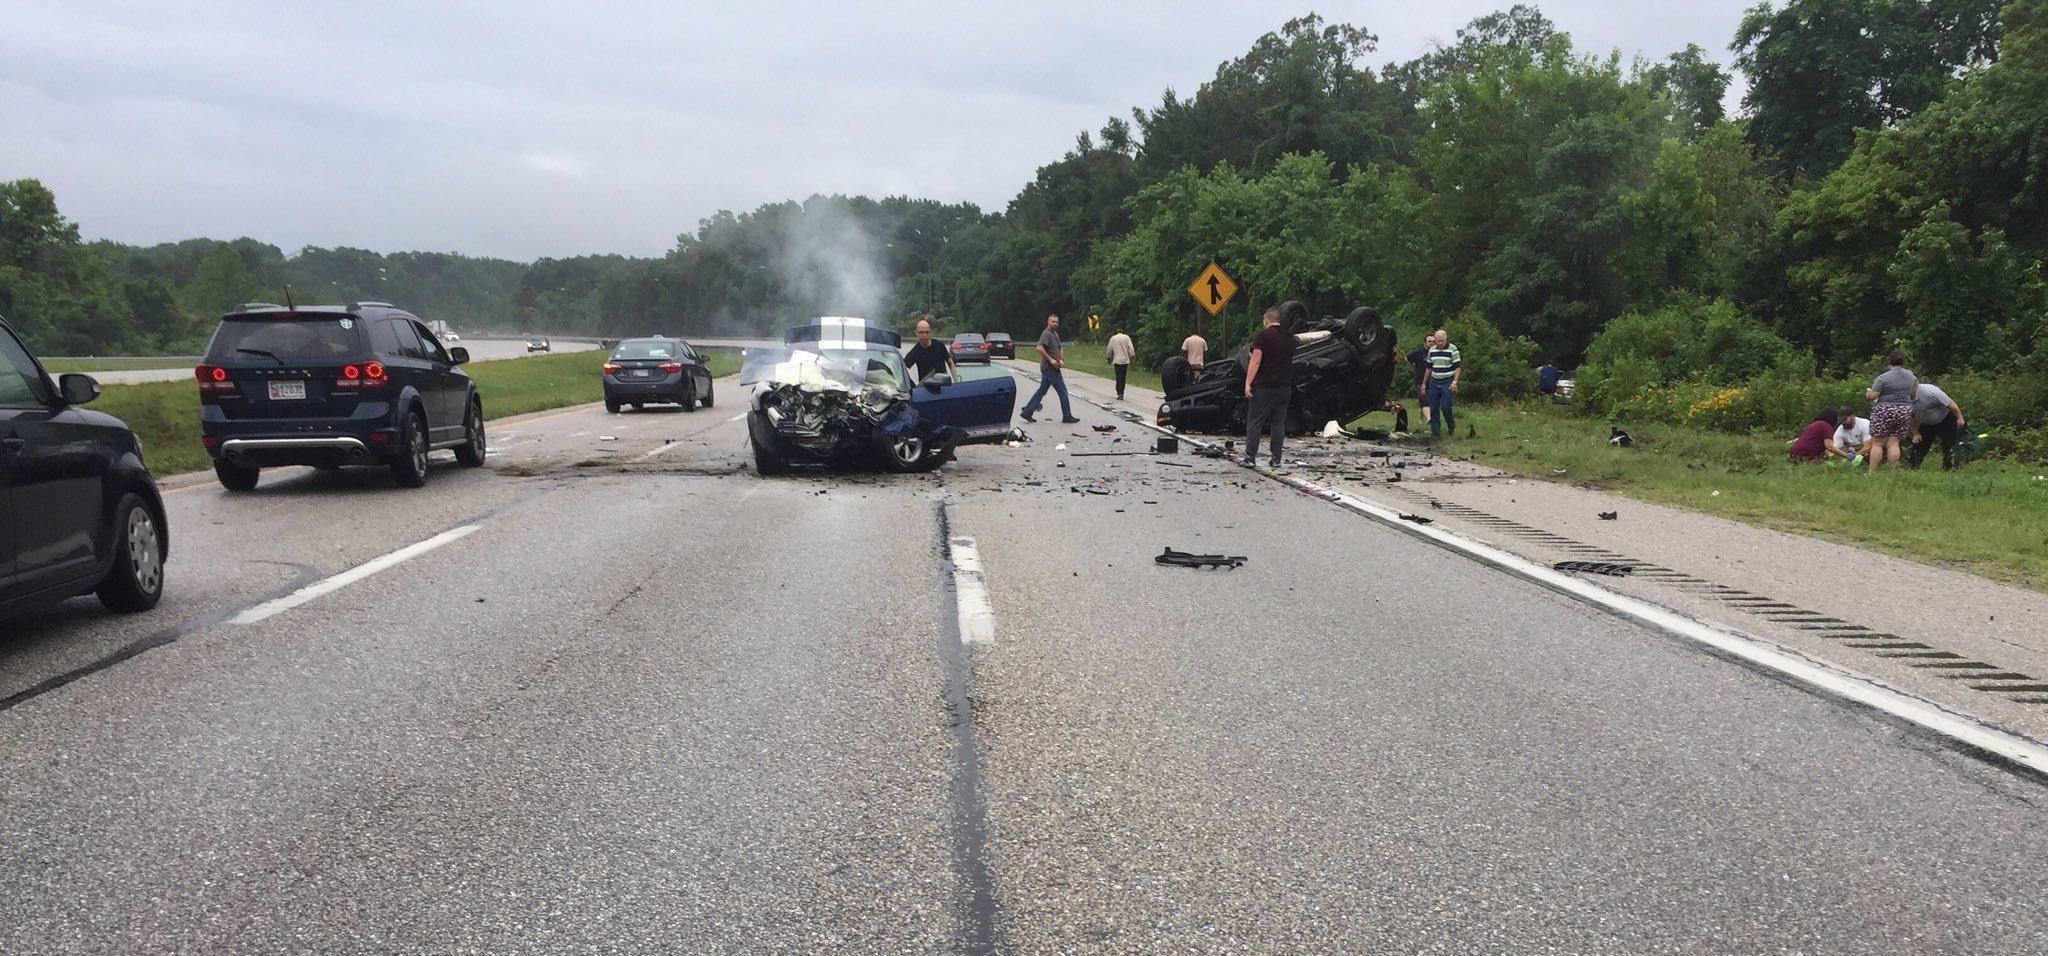 3 seriously injured in glen burnie crash baltimore sun for Department of motor vehicles glen burnie